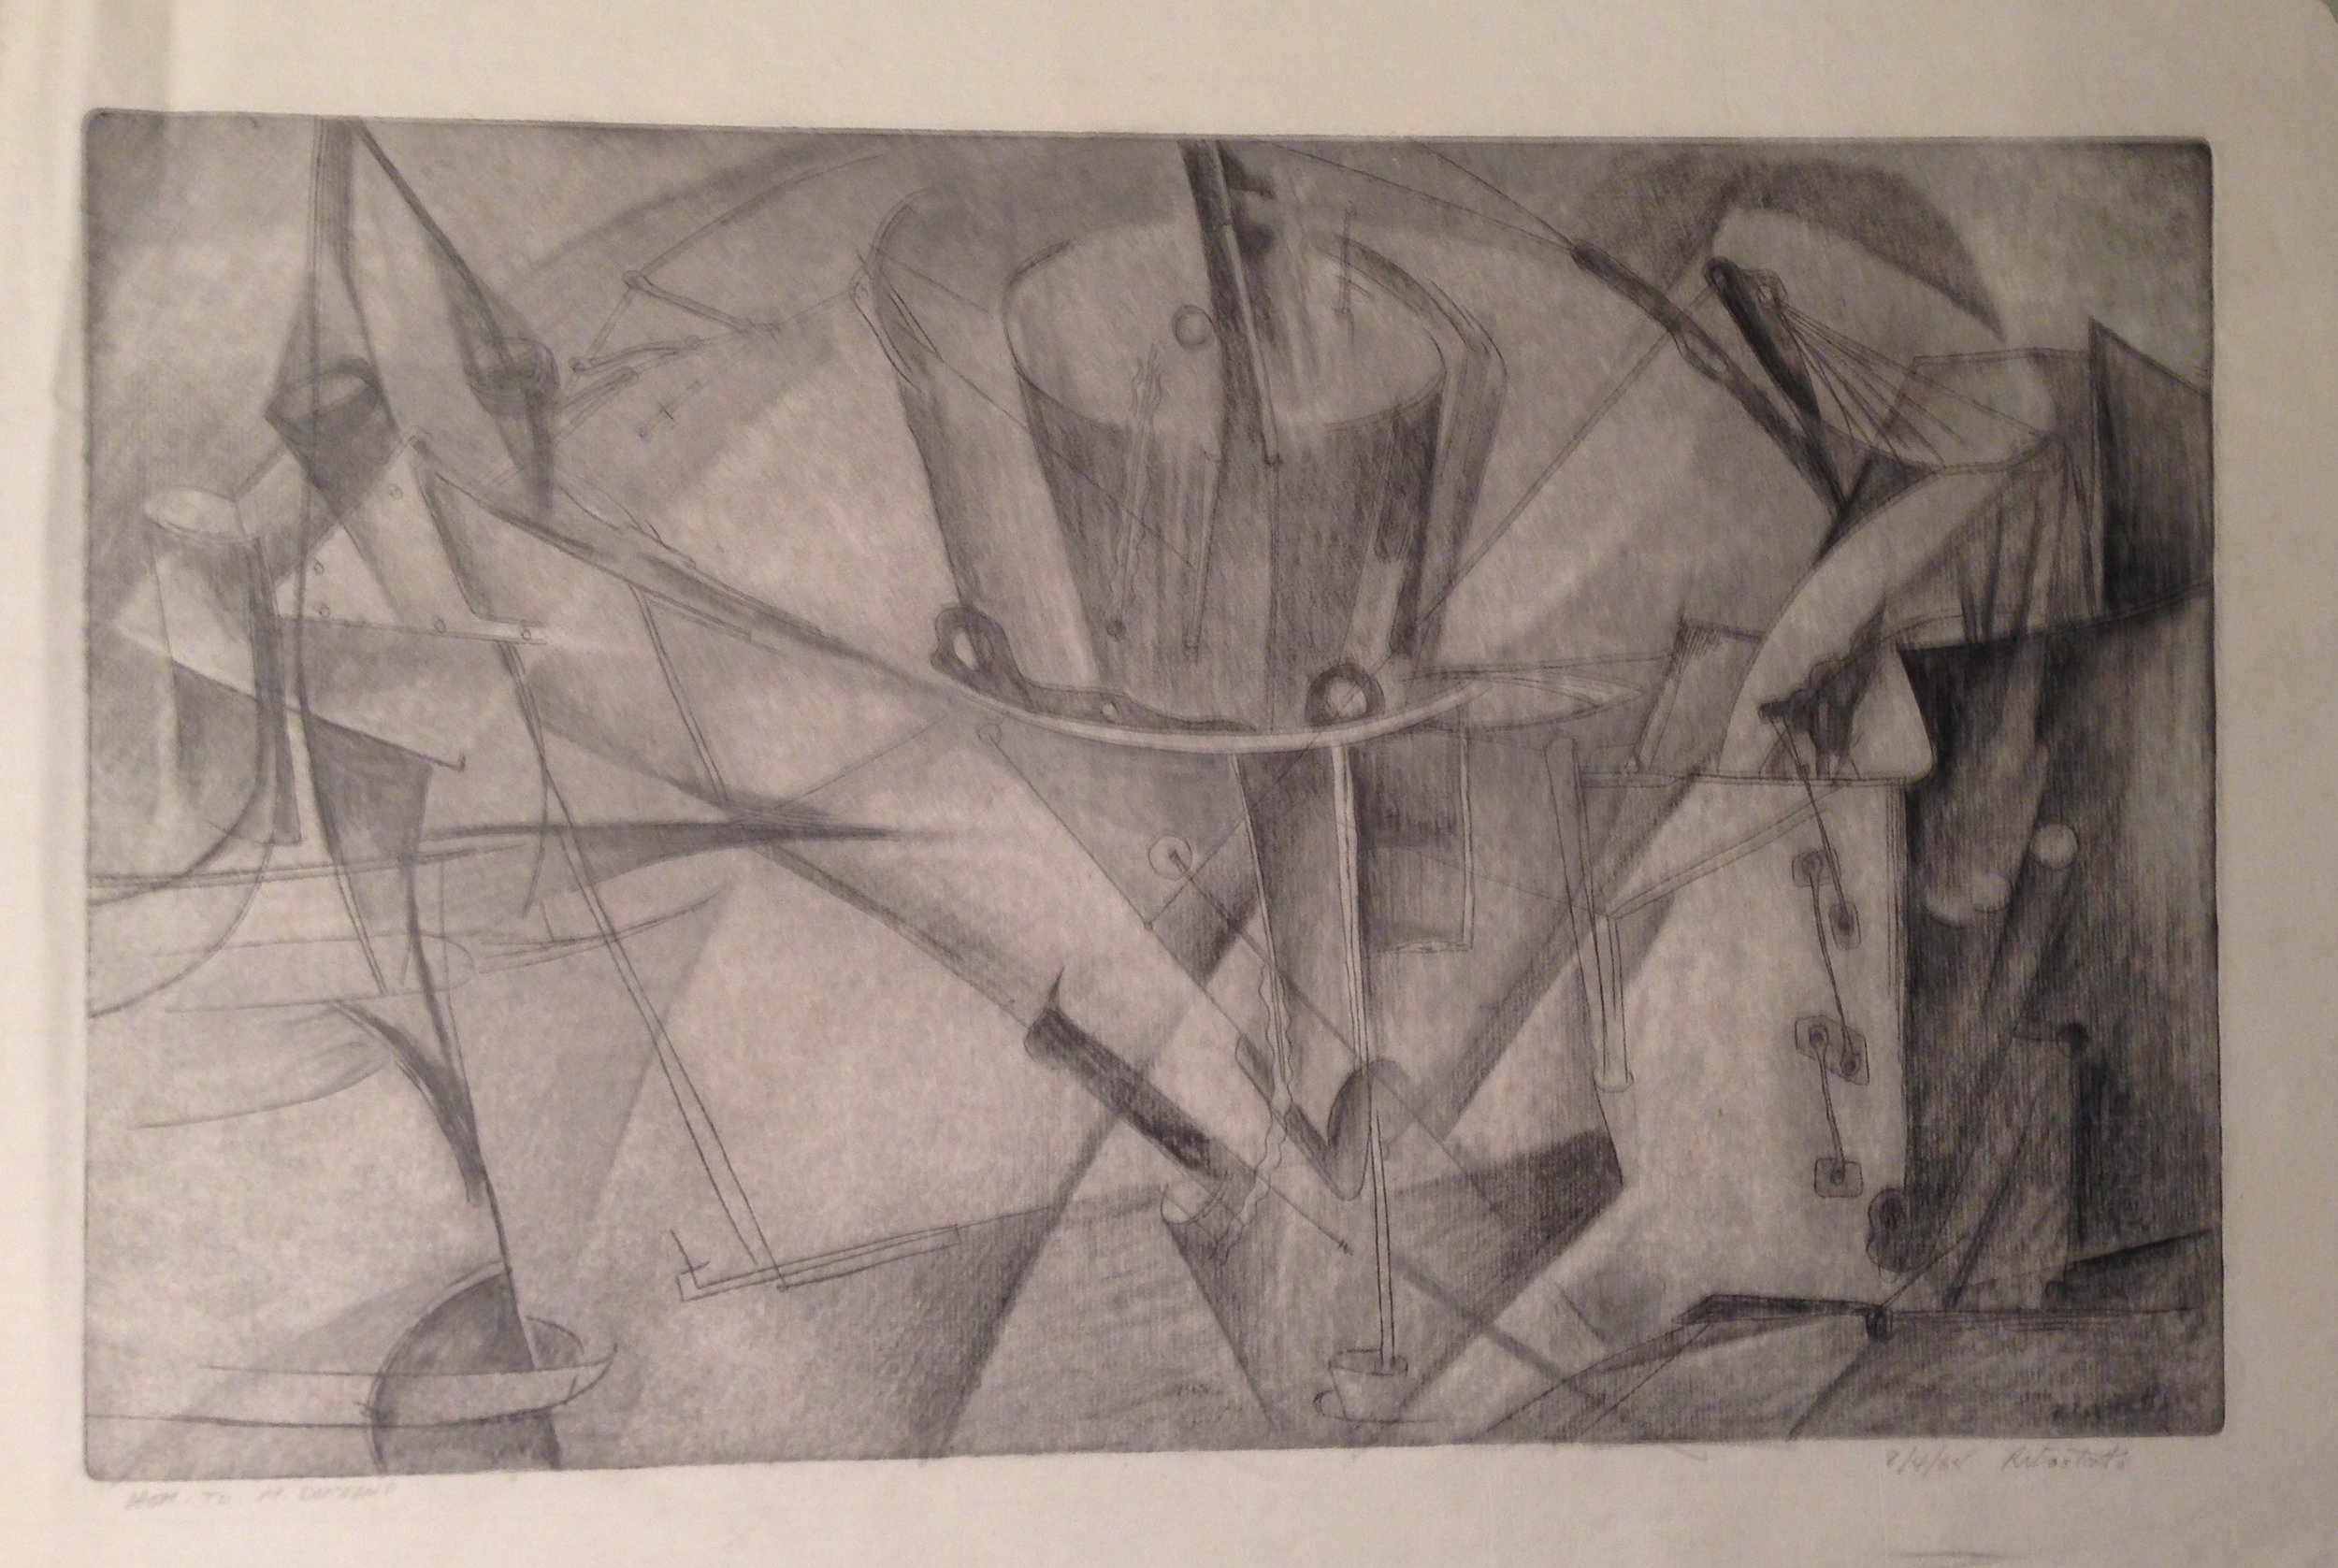 Wayne Eastcott, Hom.to M. Duchamp, 1965